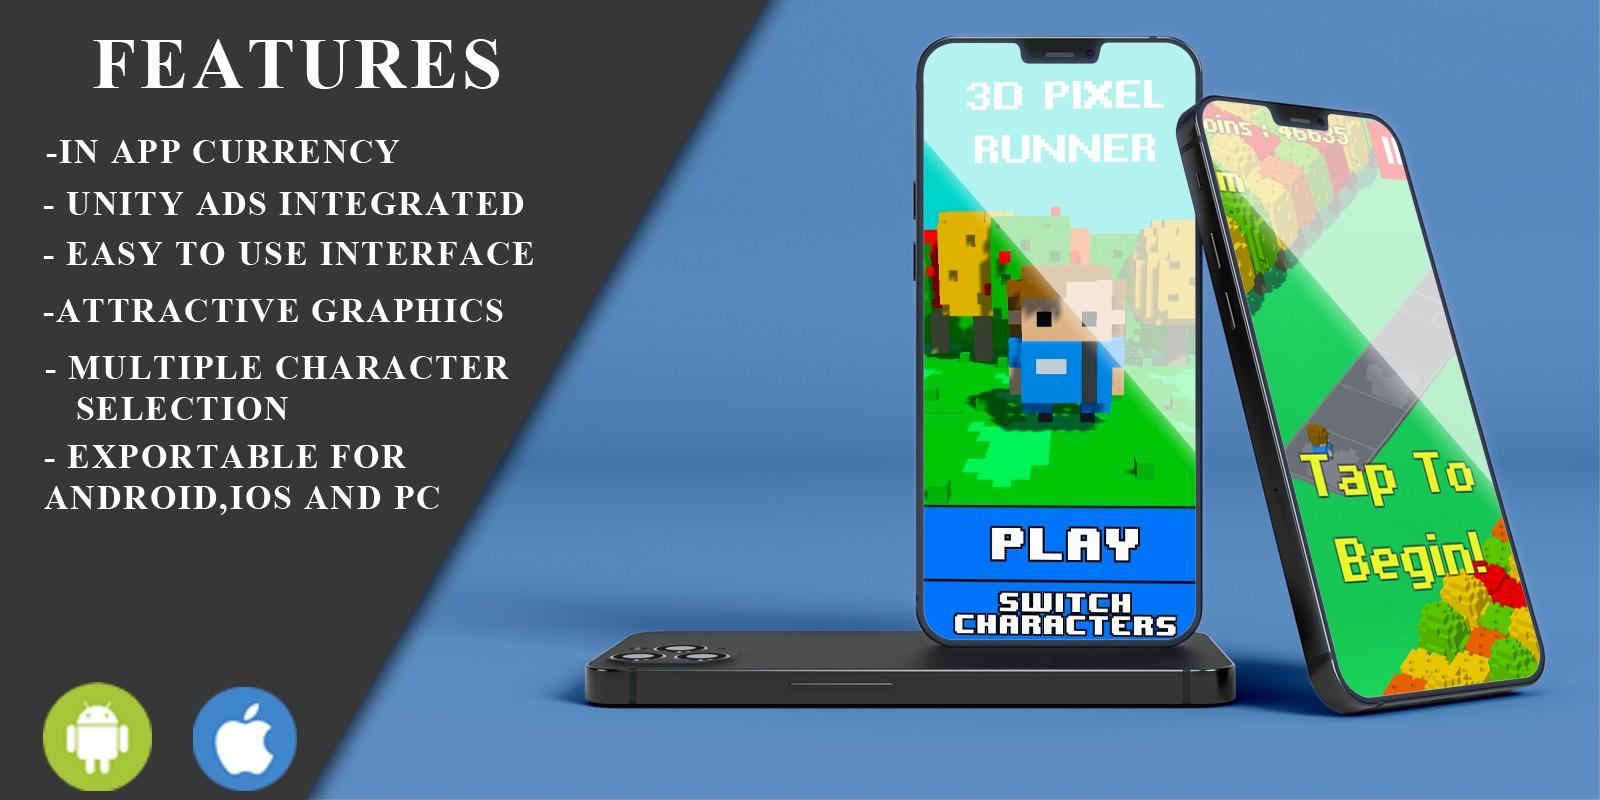 3D Pixel Ultimate Runner Unity Game